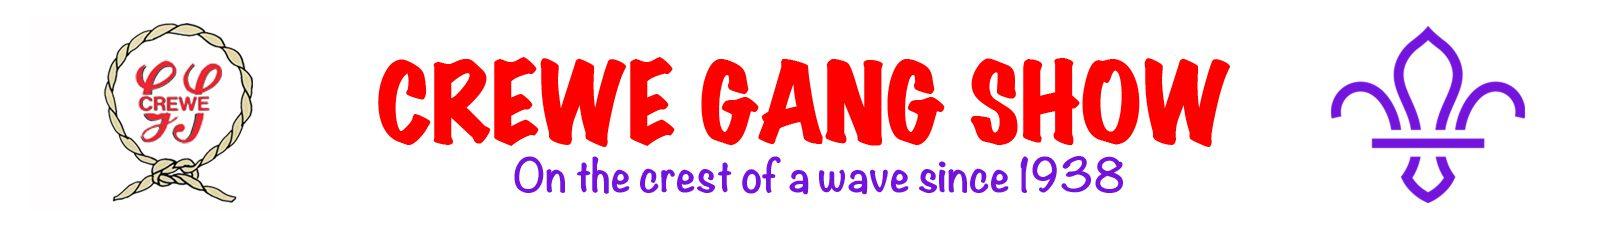 Crewe Gang Show